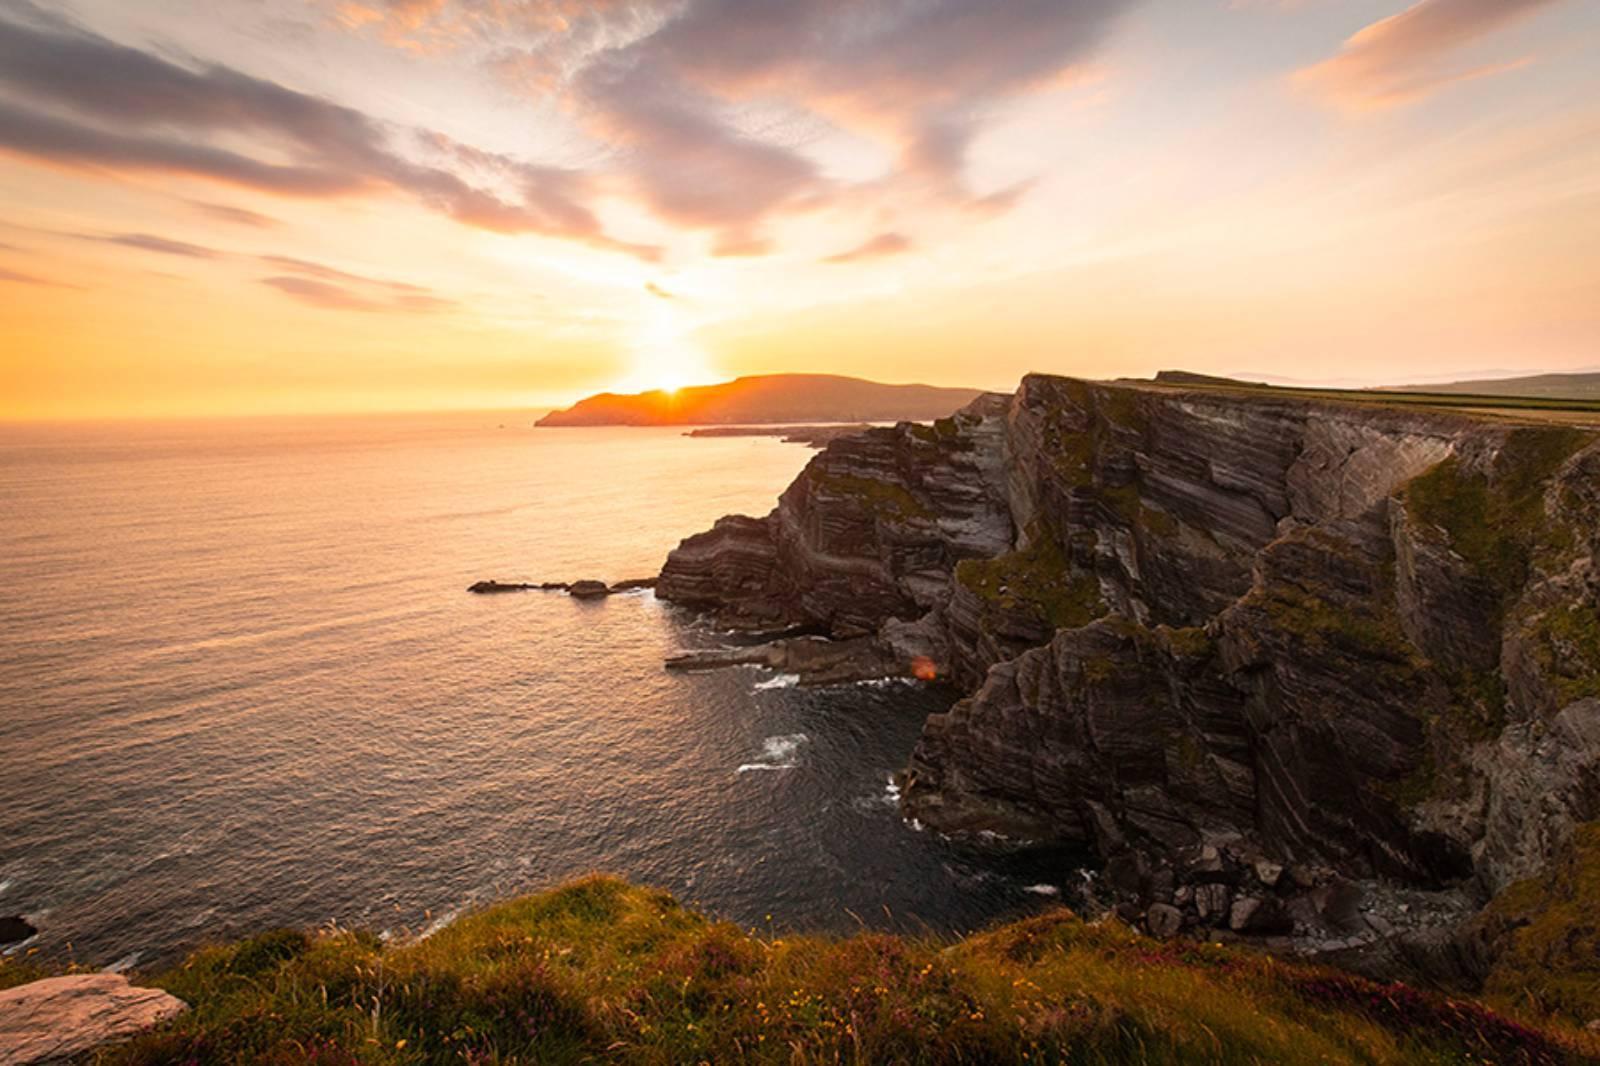 ©️ Office du tourisme d'Irlande